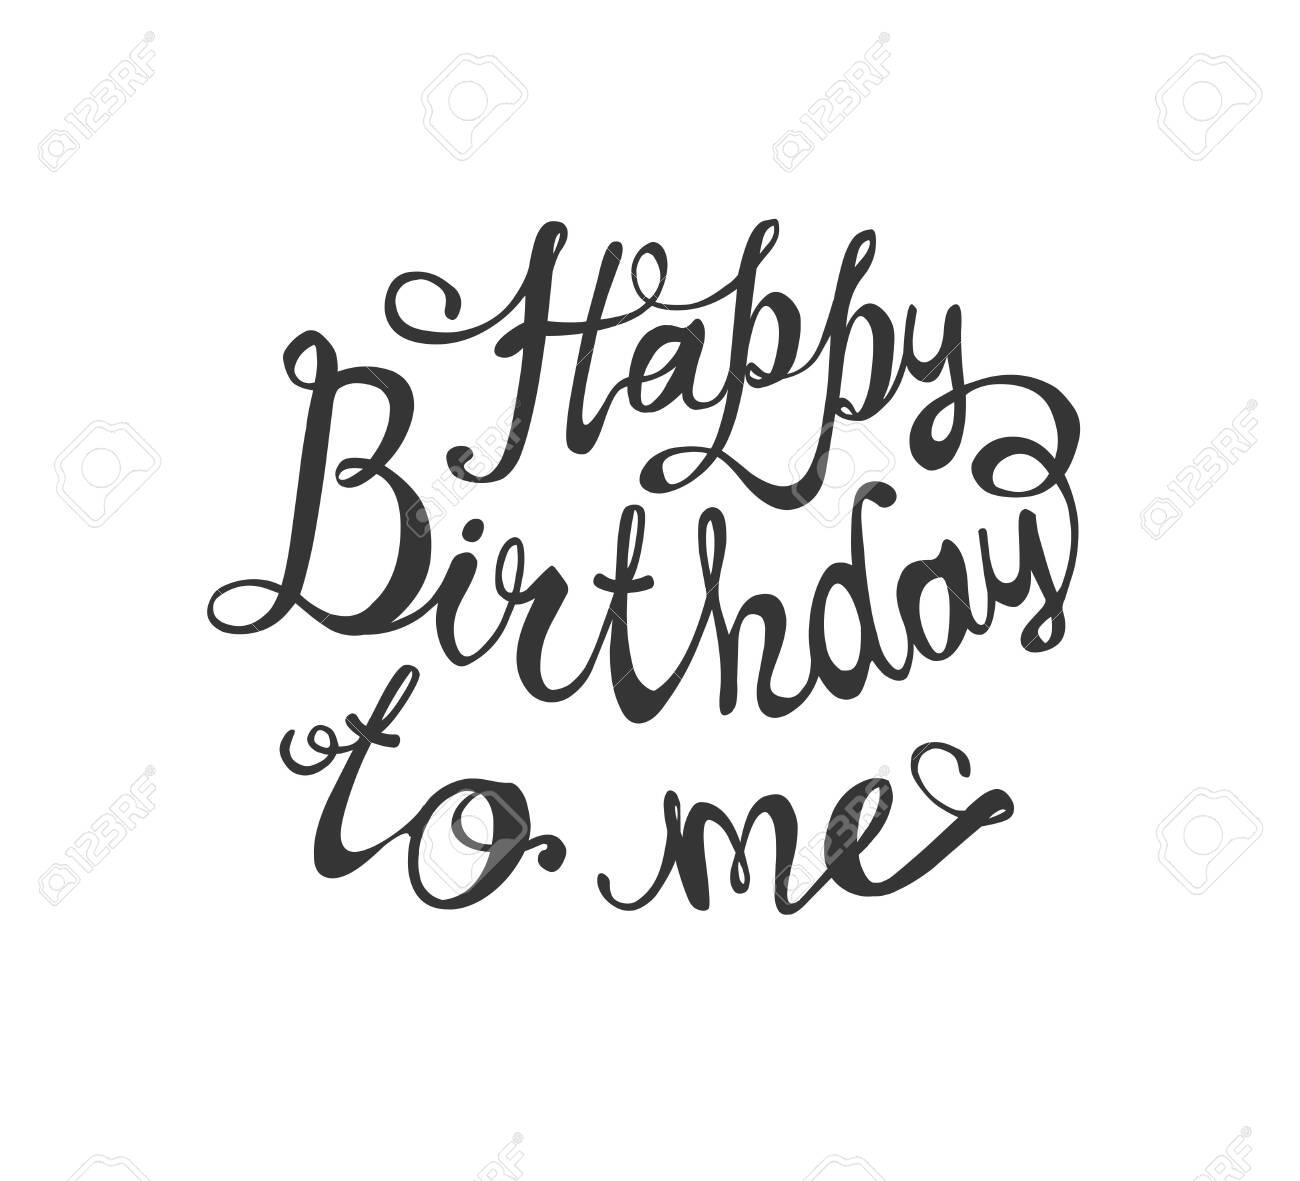 Happy Birthday To Me.Happy Birthday To Me Calligraphic Vector Inscription